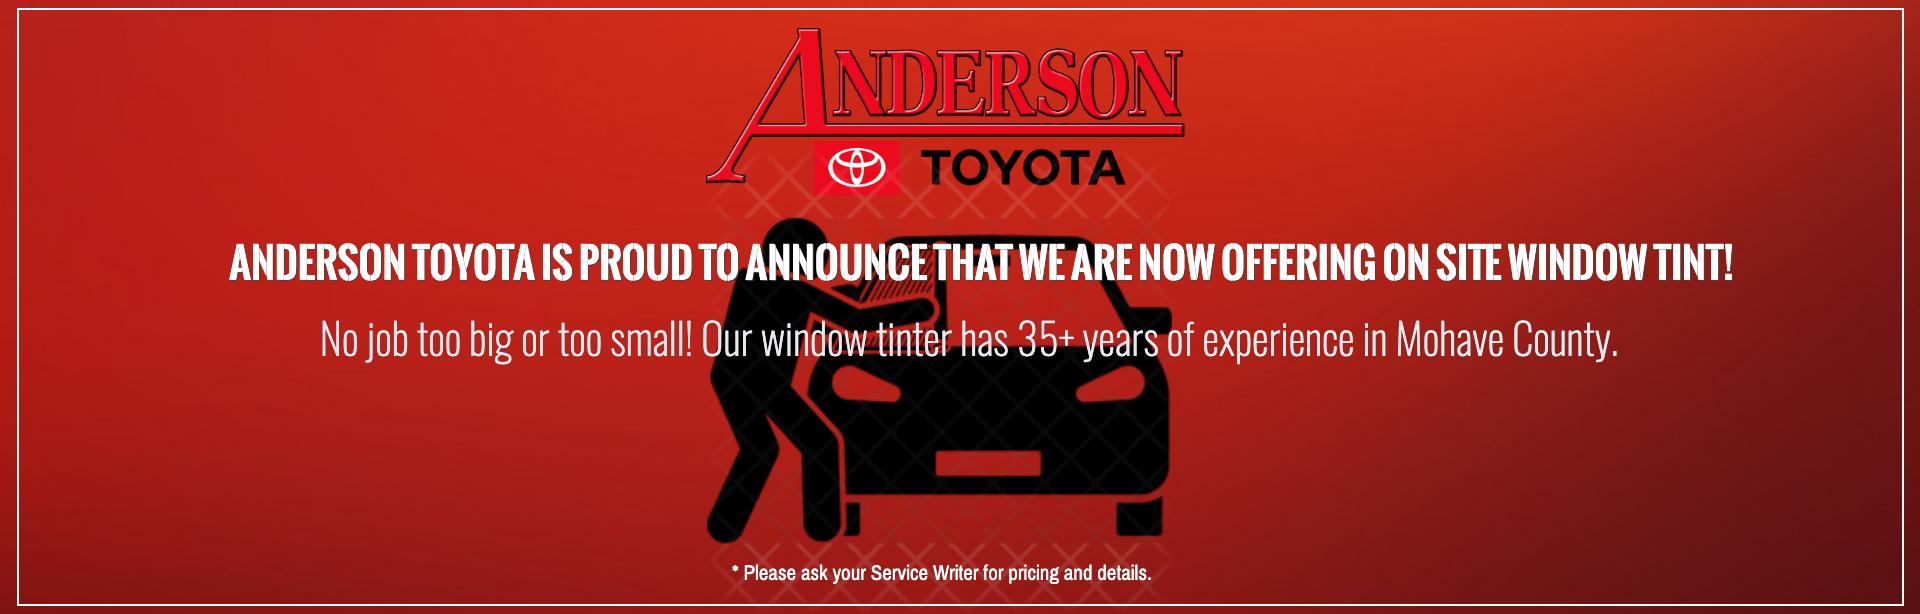 Anderson Toyota Window Tint